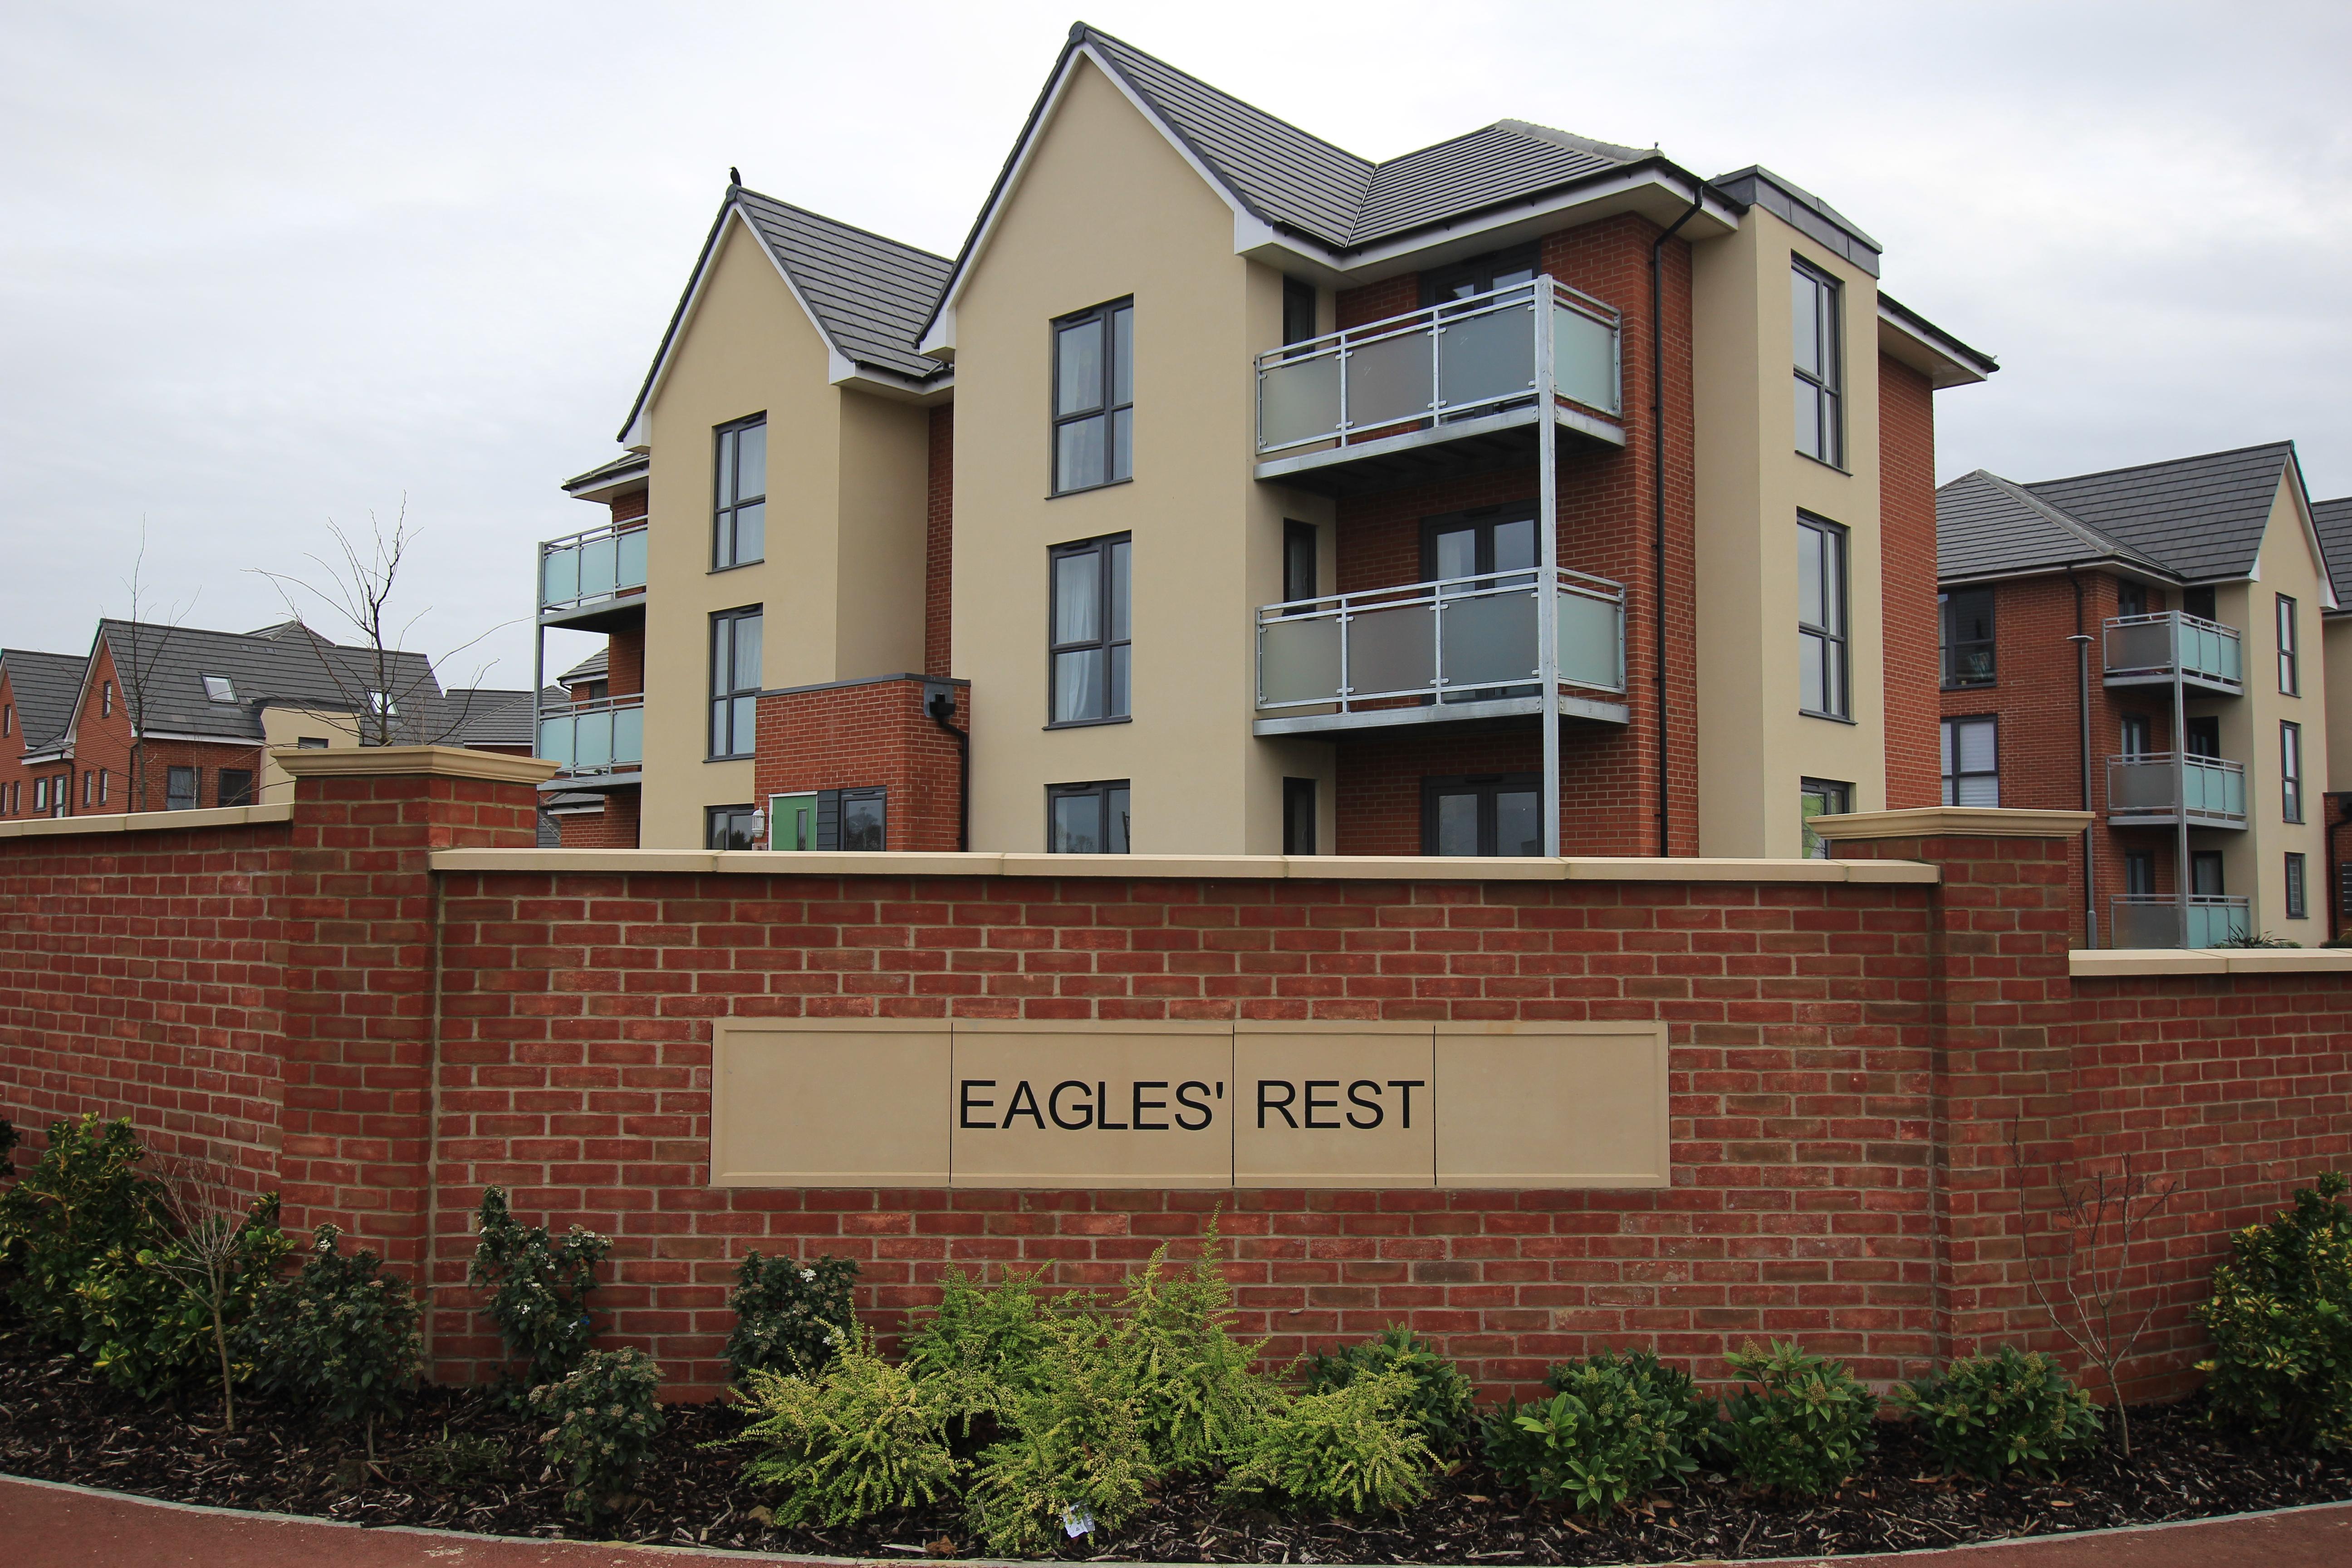 28, Fullers Ground, Milton Keynes , Buckinghamshire Image